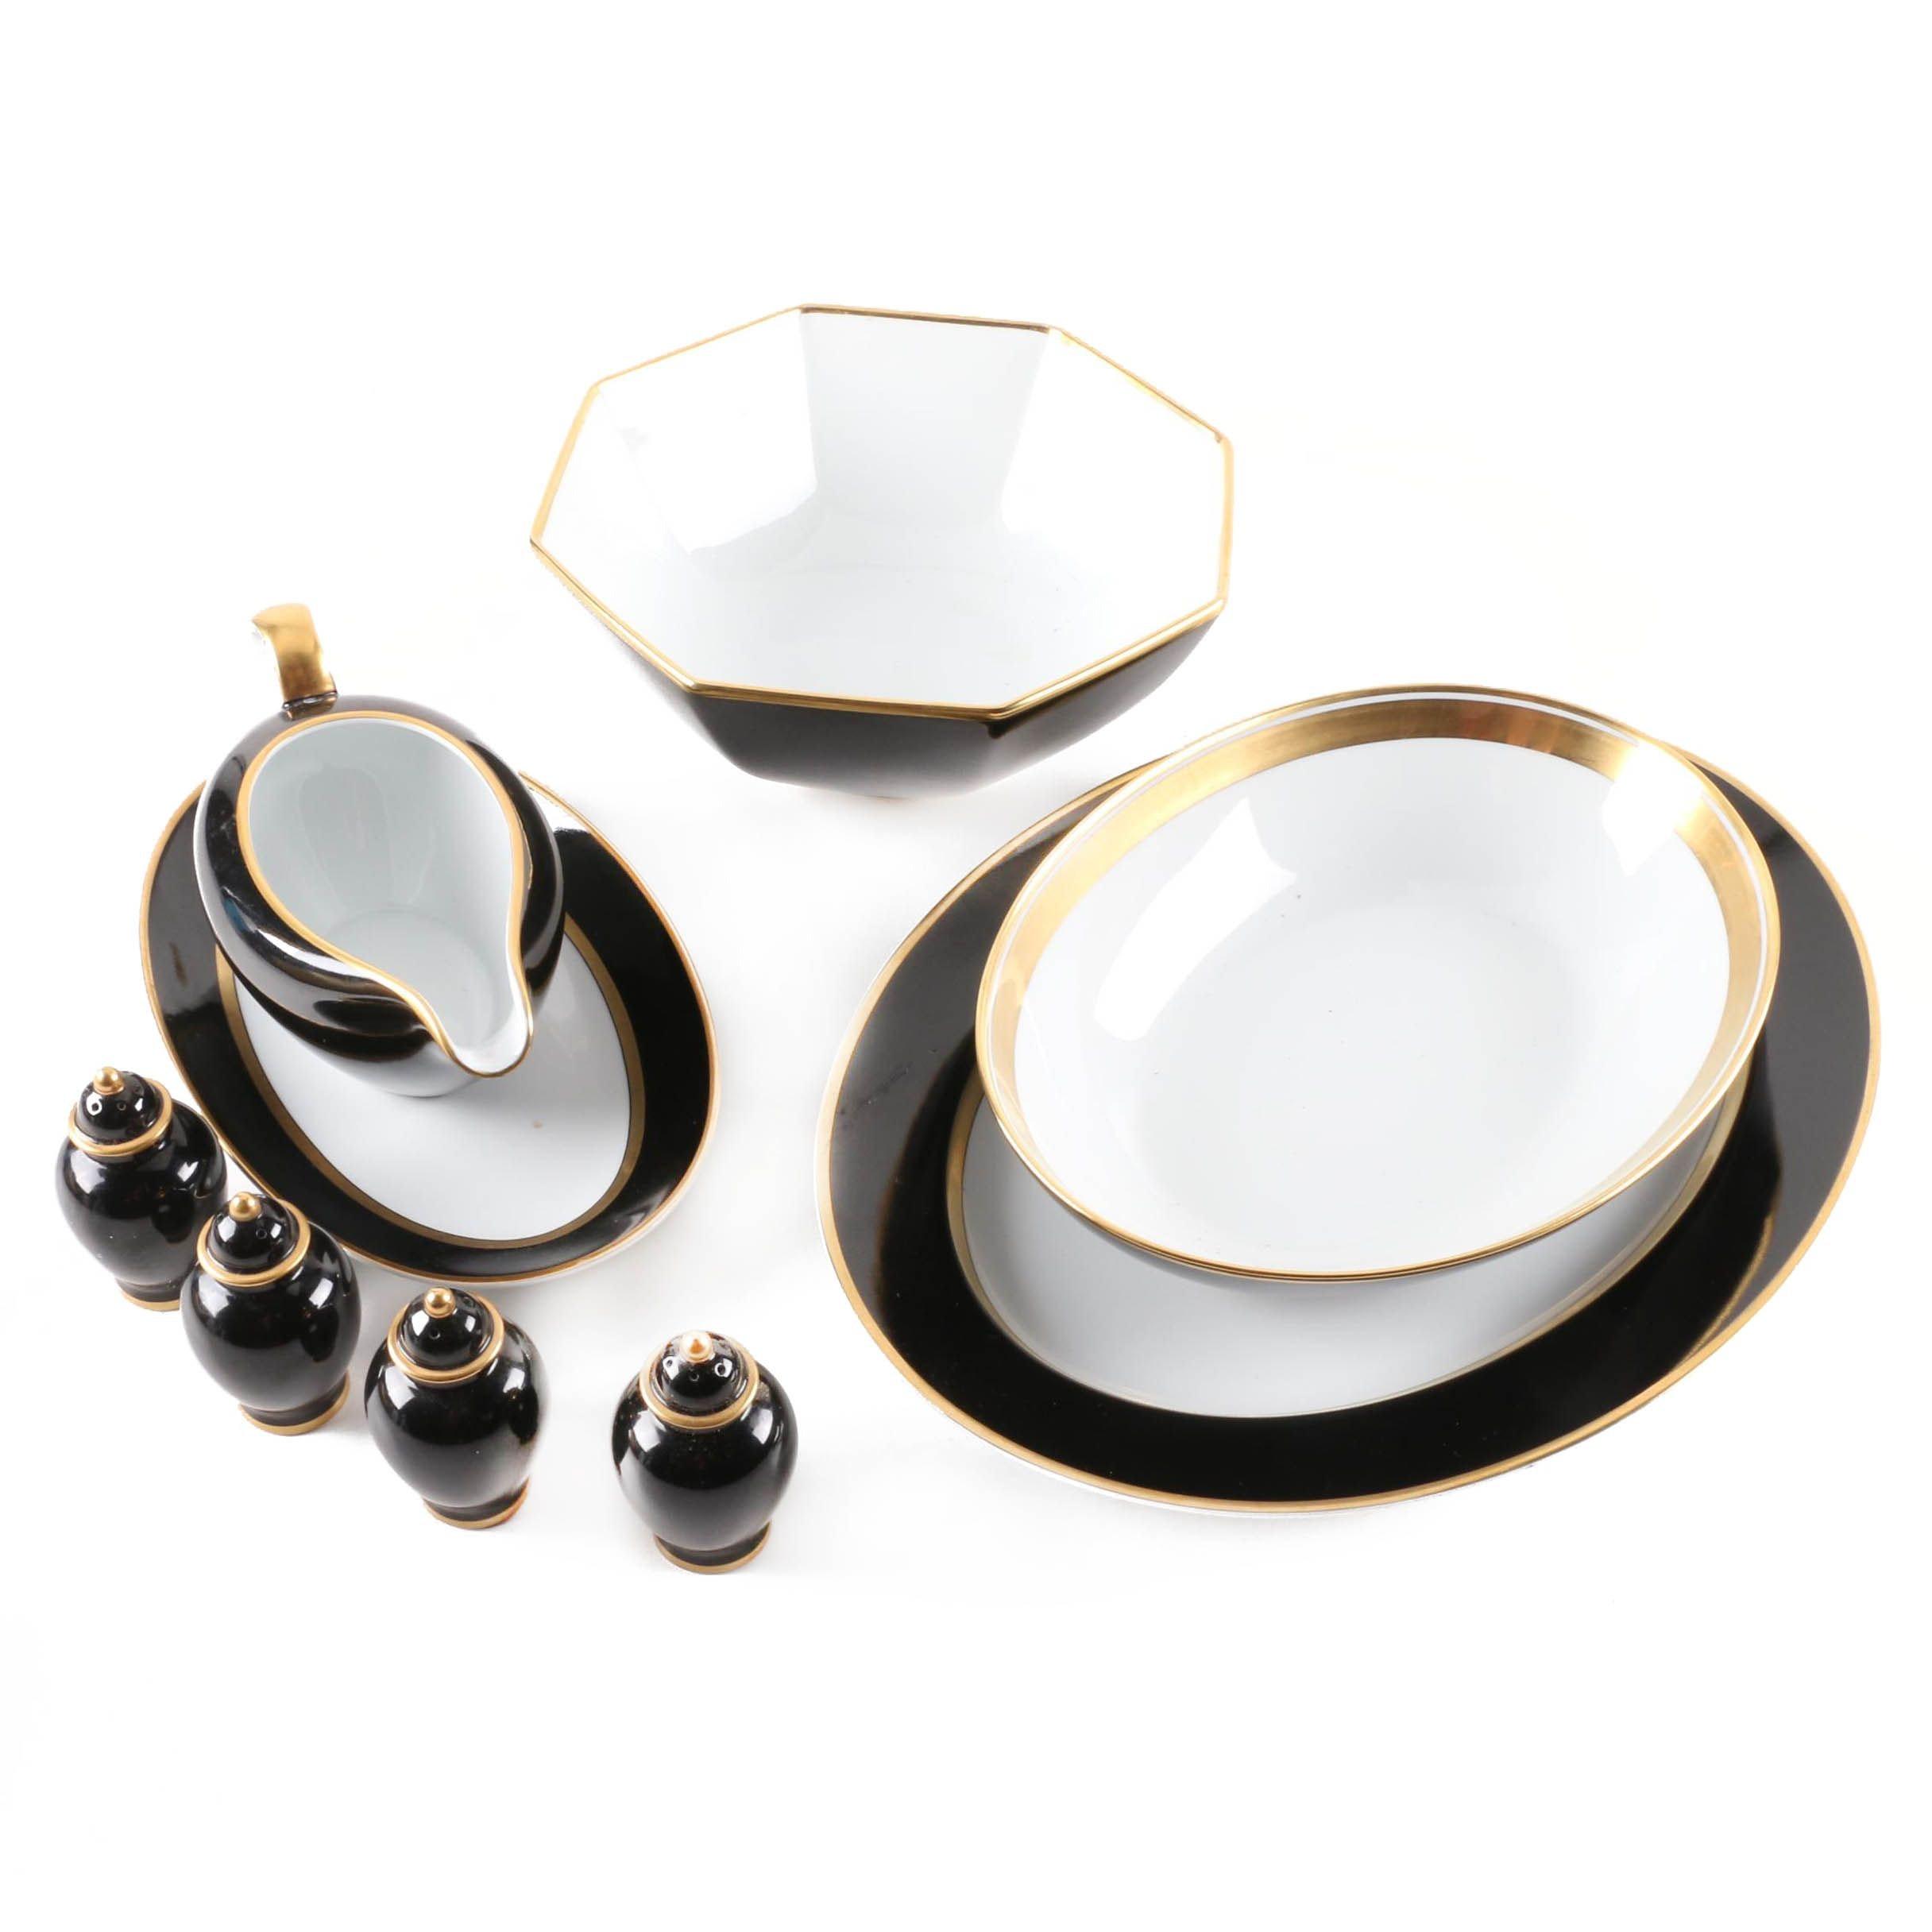 "Fitz and Floyd ""Renaissance"" Porcelain Tableware"